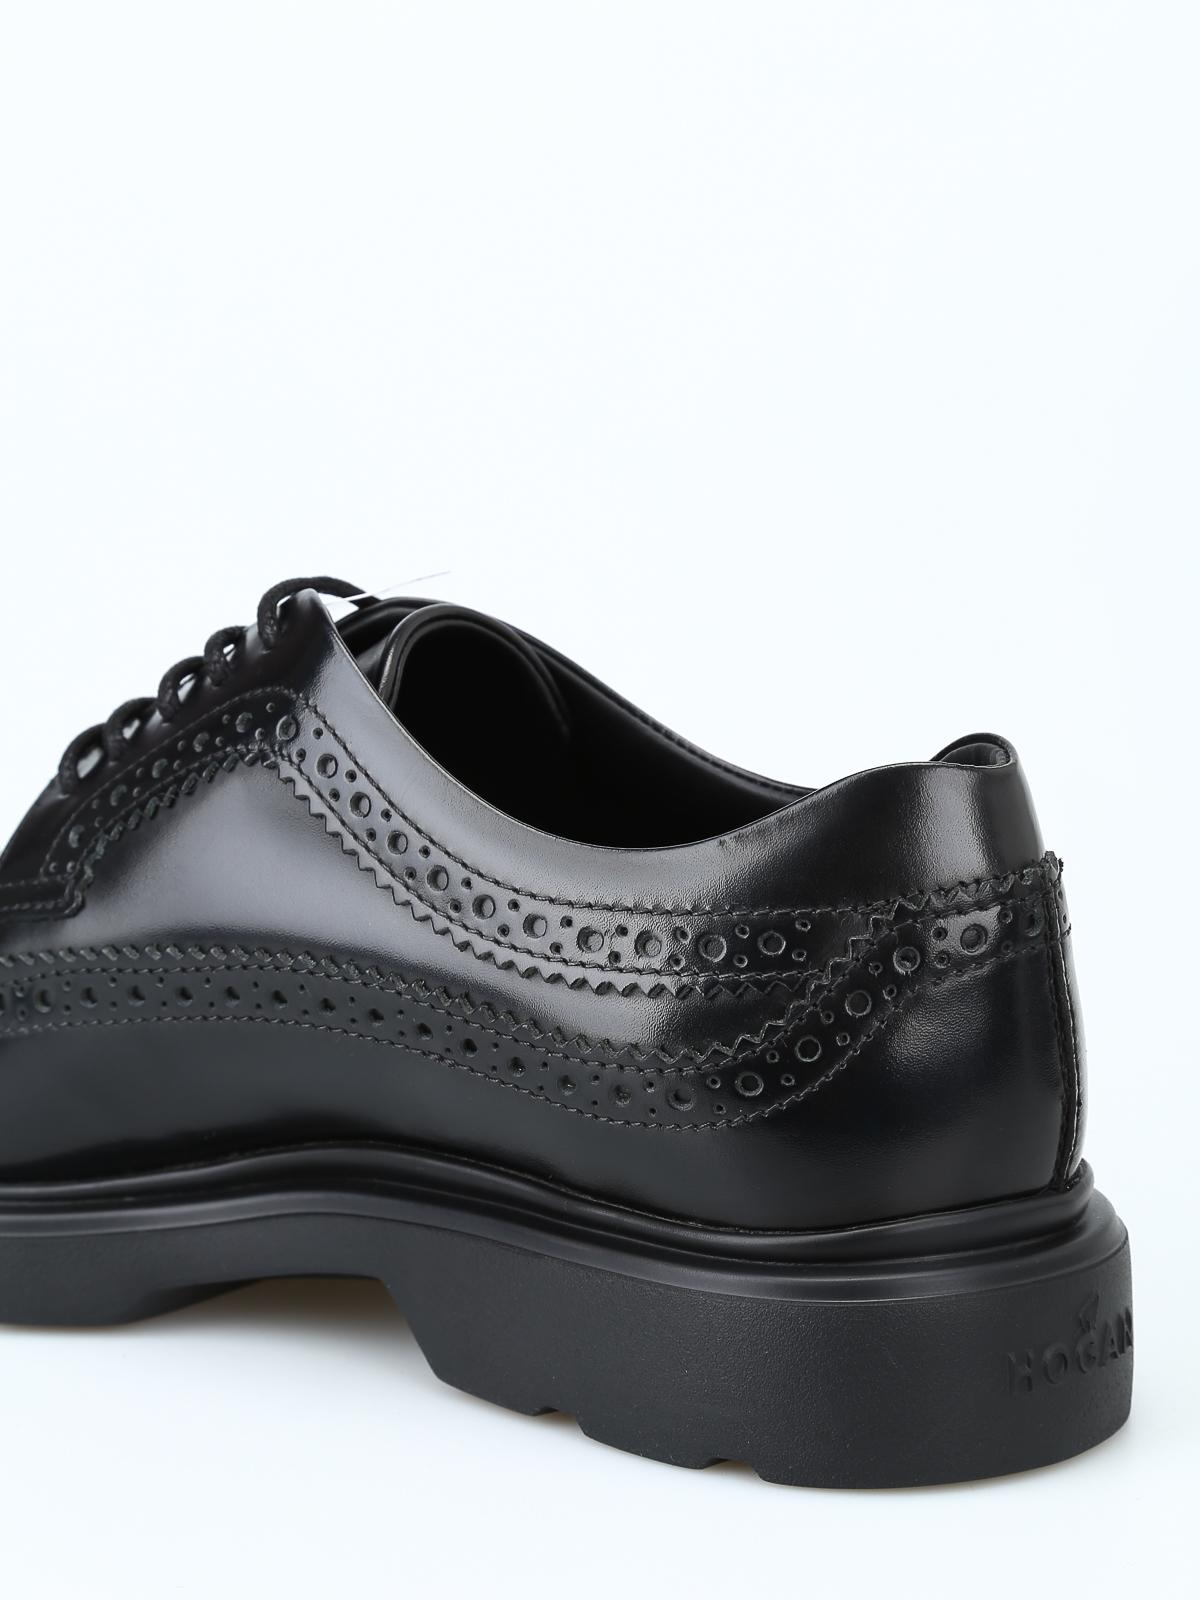 Hogan - Derby stringate H393 nere con memory foam - scarpe stringate ... e8b76b03889